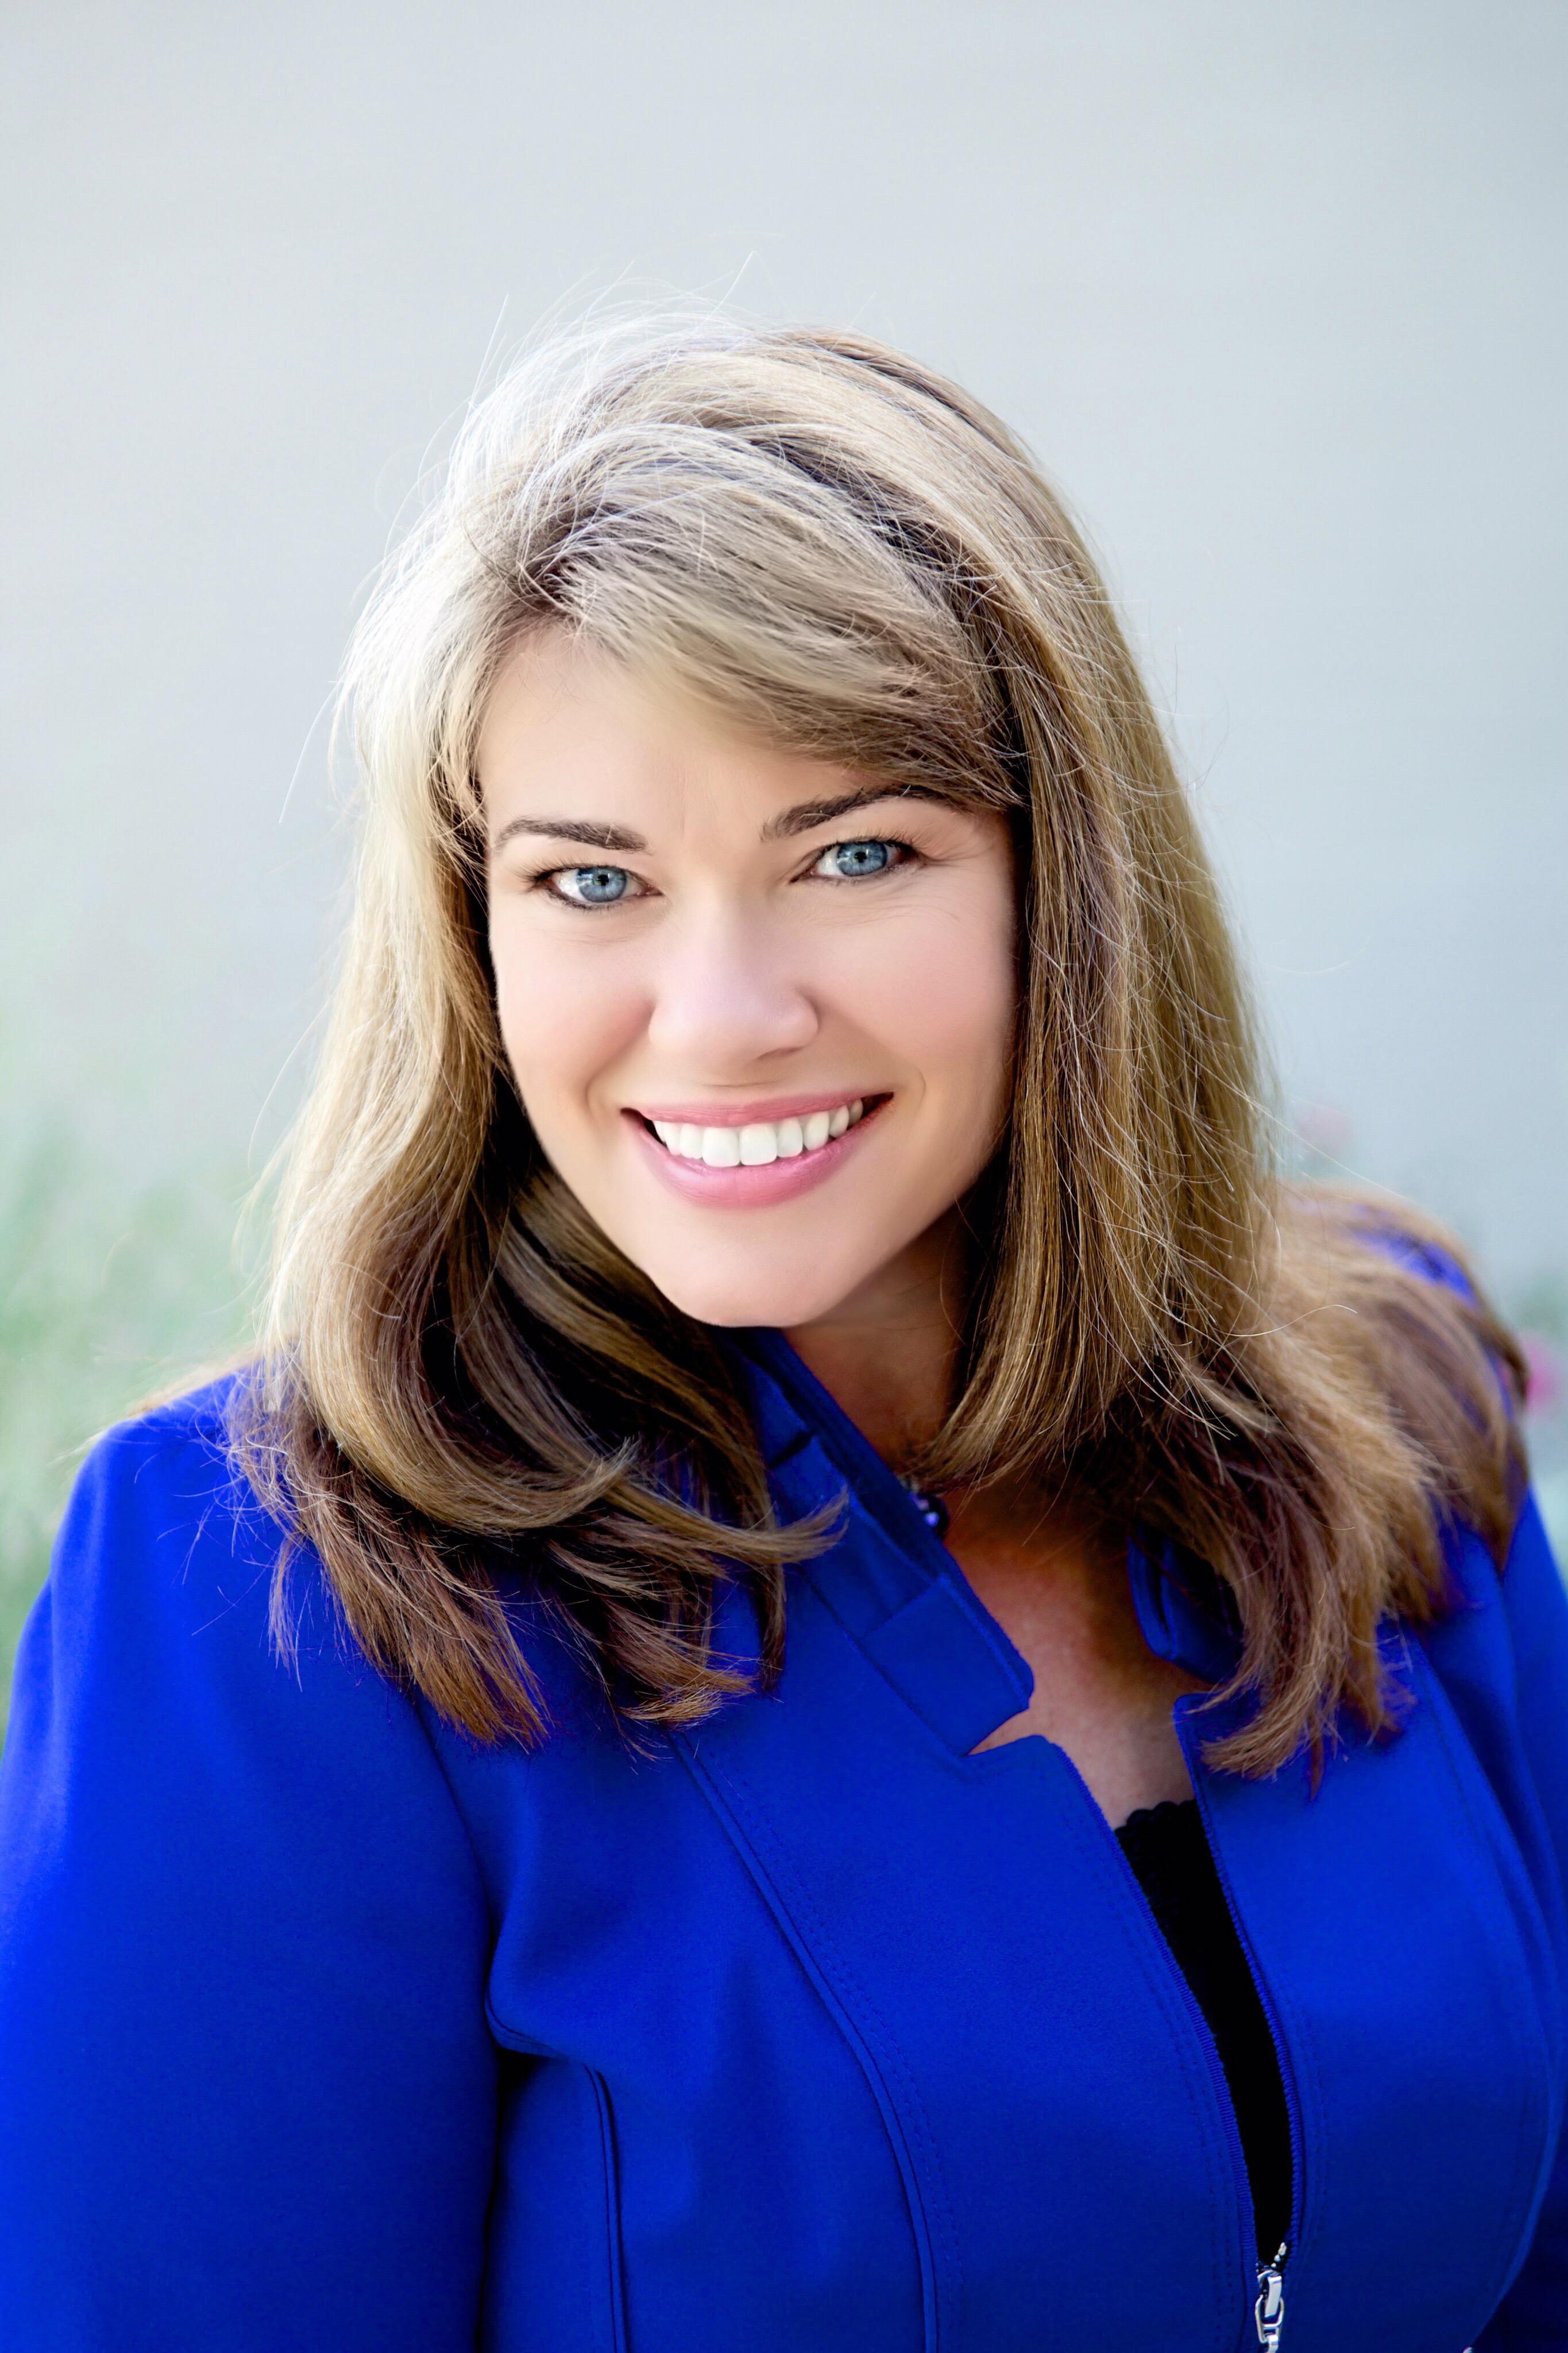 Amy Groden-Morrison